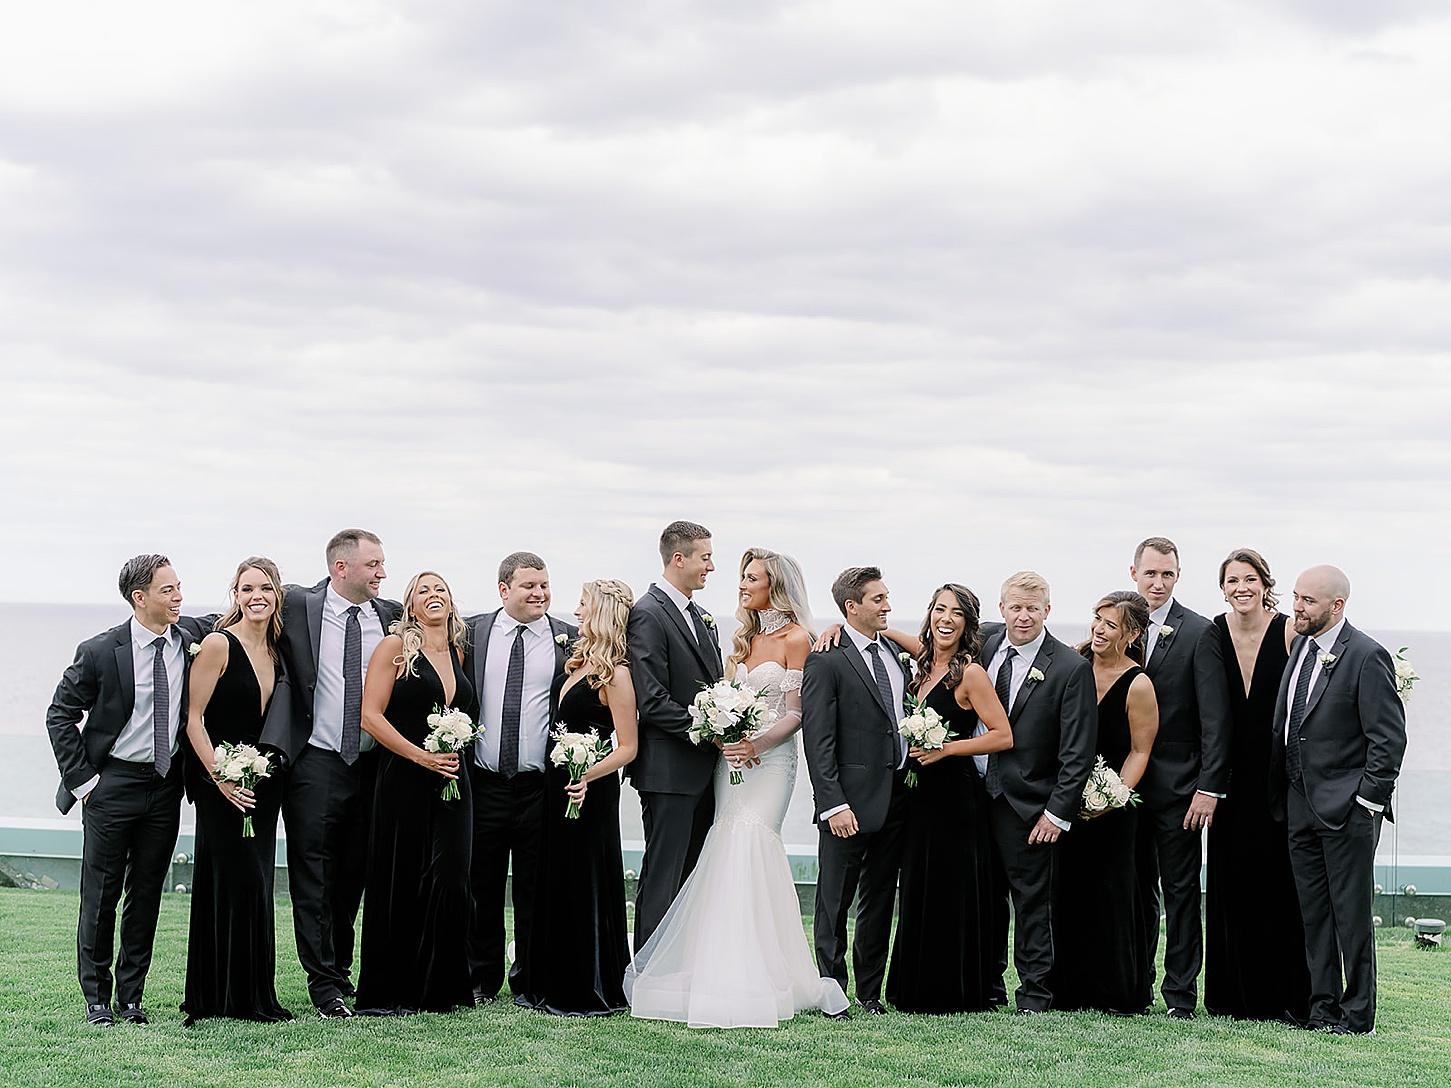 Atlantic City Wedding Photography Studio by Magdalena Studios Lexy Cha 0039